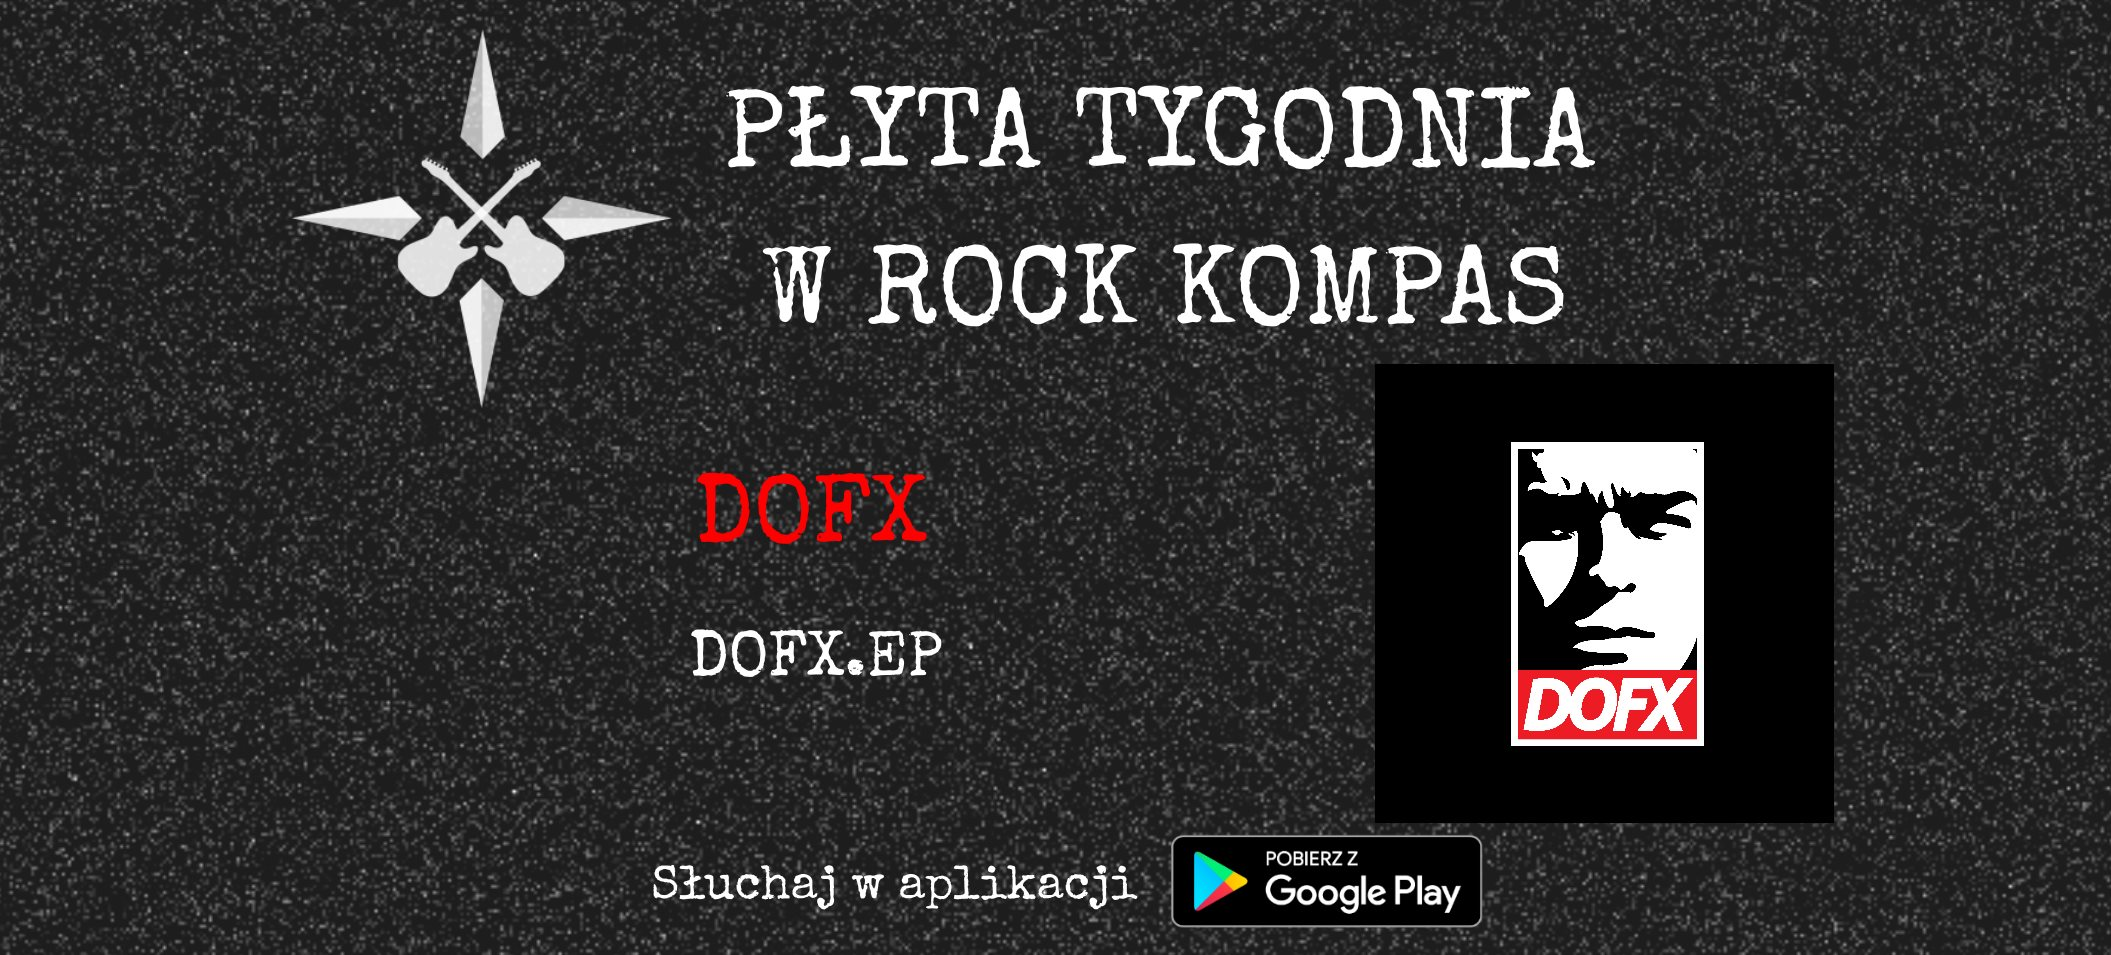 Płyta tygodnia w Rock Kompas: DOFX - DOFX.EP